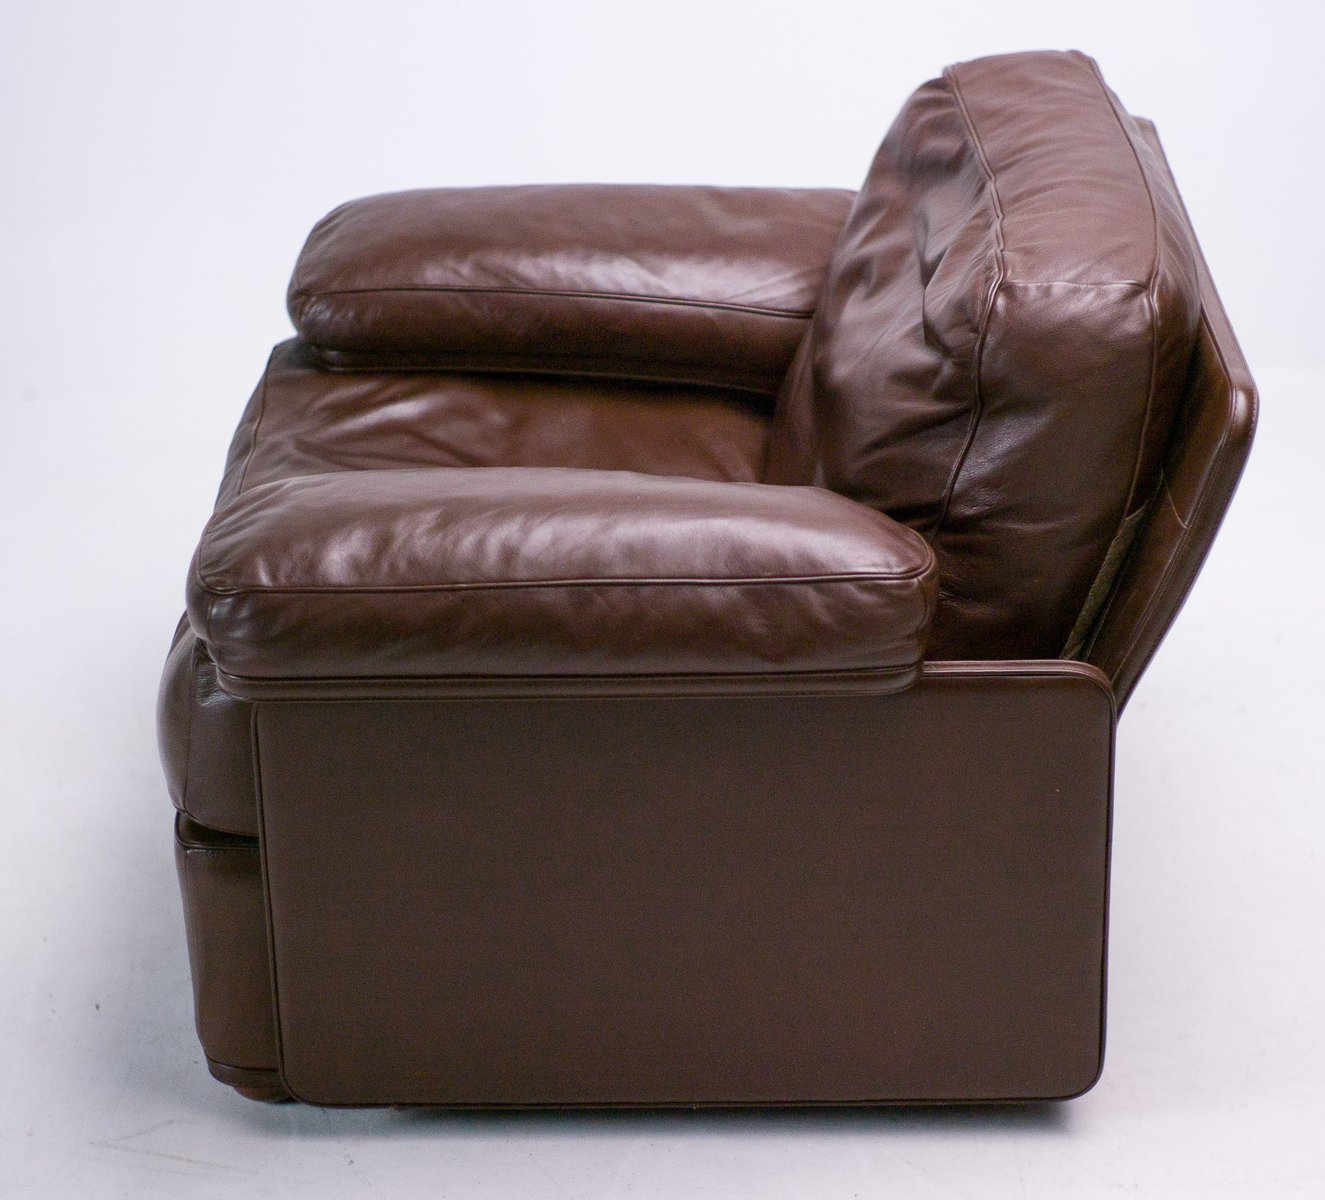 vintage sessel aus leder von tito agnoli f r poltrona frau. Black Bedroom Furniture Sets. Home Design Ideas